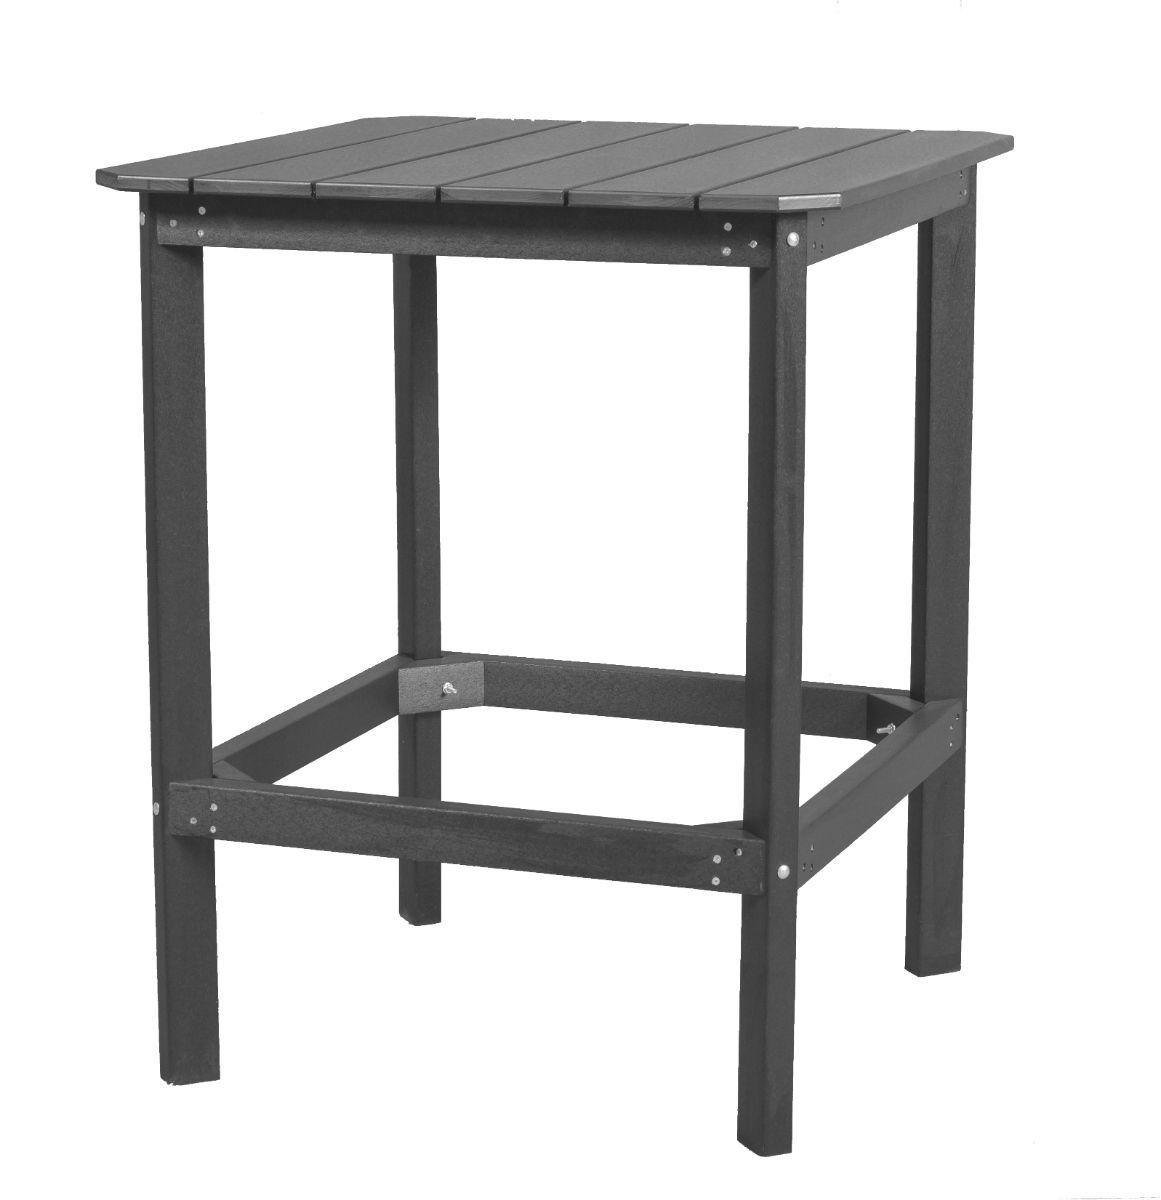 Dark Gray Panama High Outdoor Dining Table